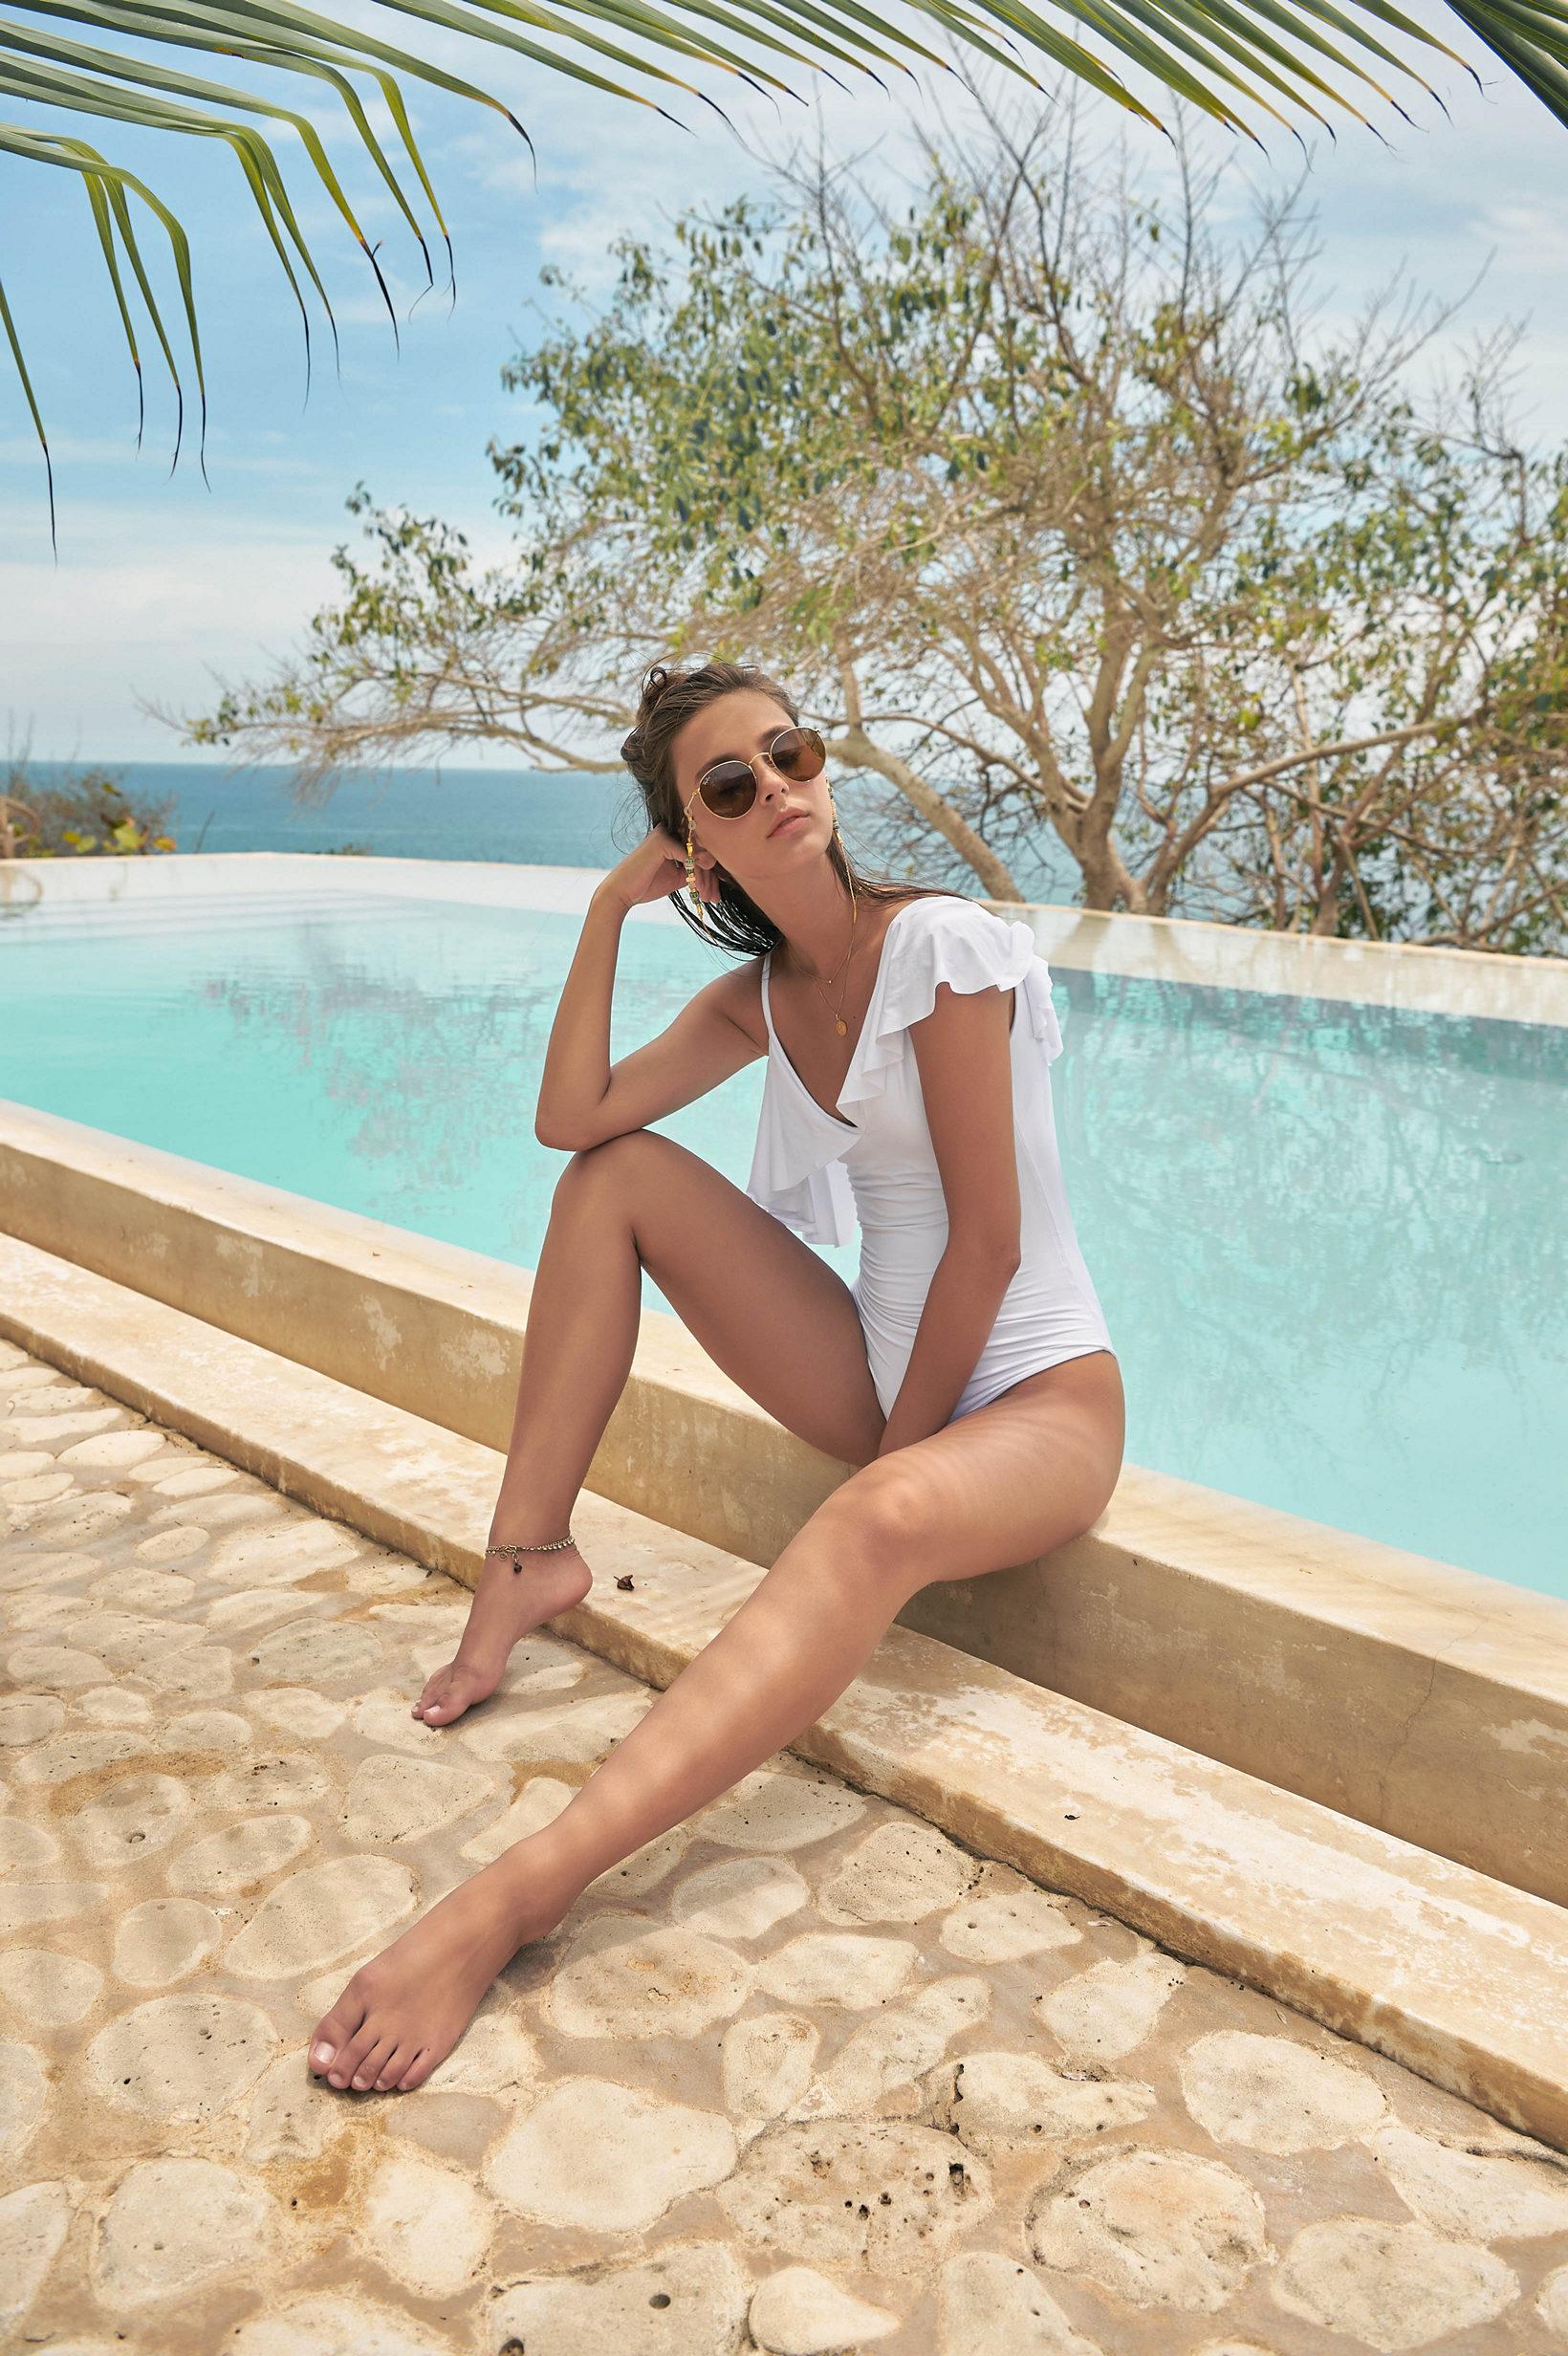 2019 Malai Swimwear at Butterflies and Bikinis featuring the Malai White Ruffle One Piece